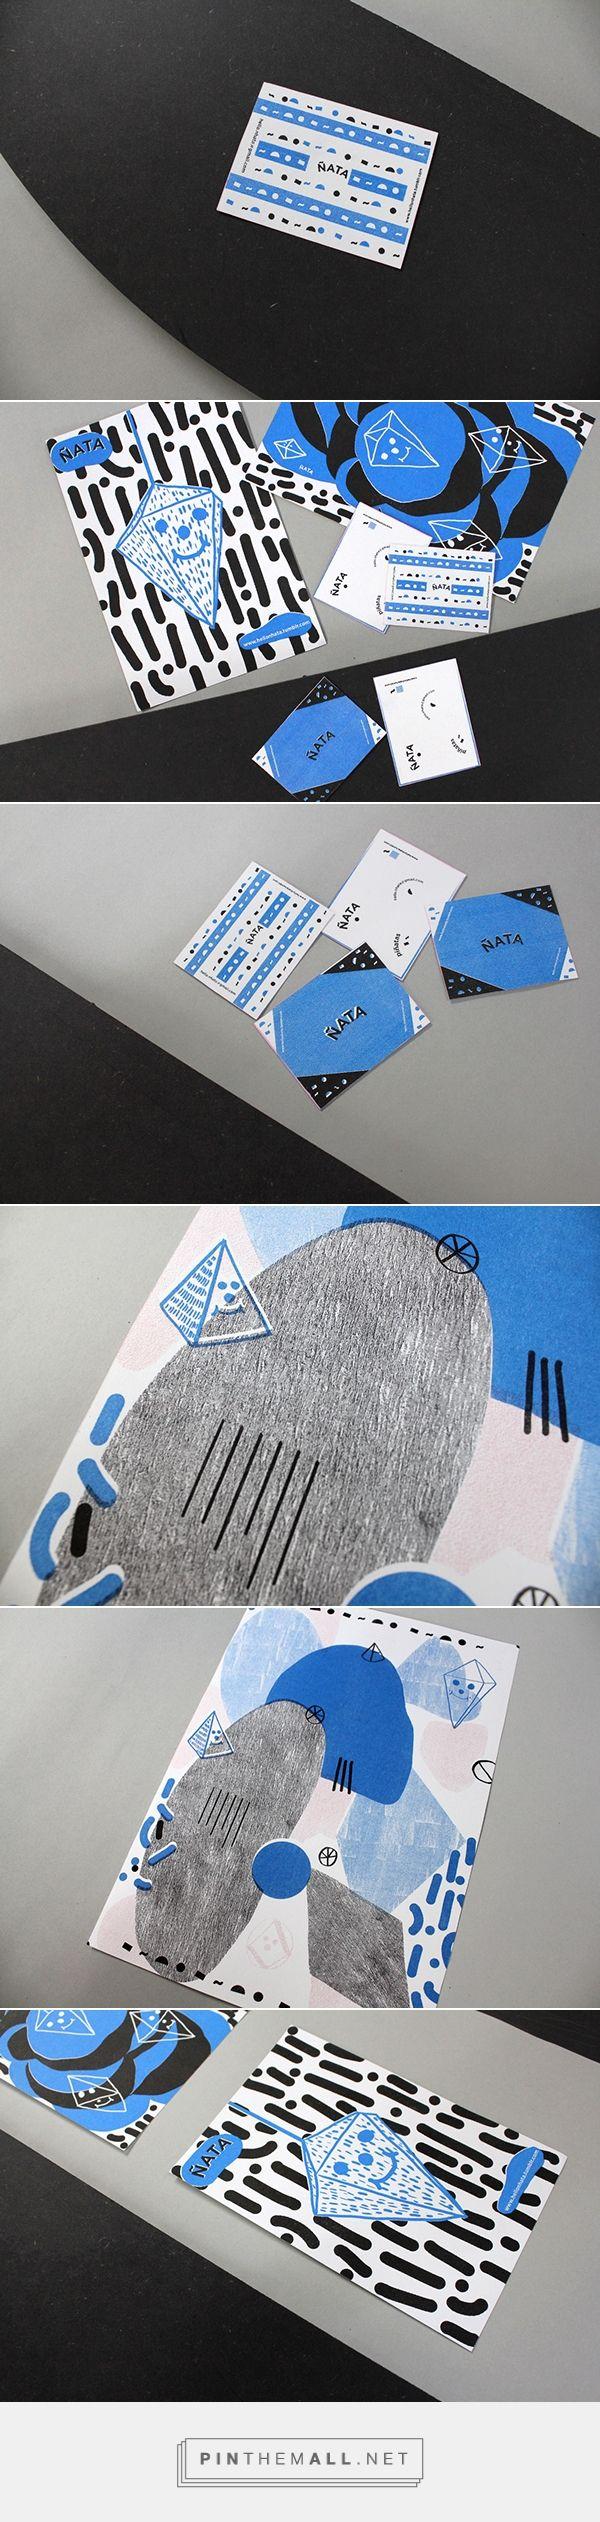 Ñata Visual Identity on Behance | Fivestar Branding – Design and Branding Agency & Inspiration Gallery